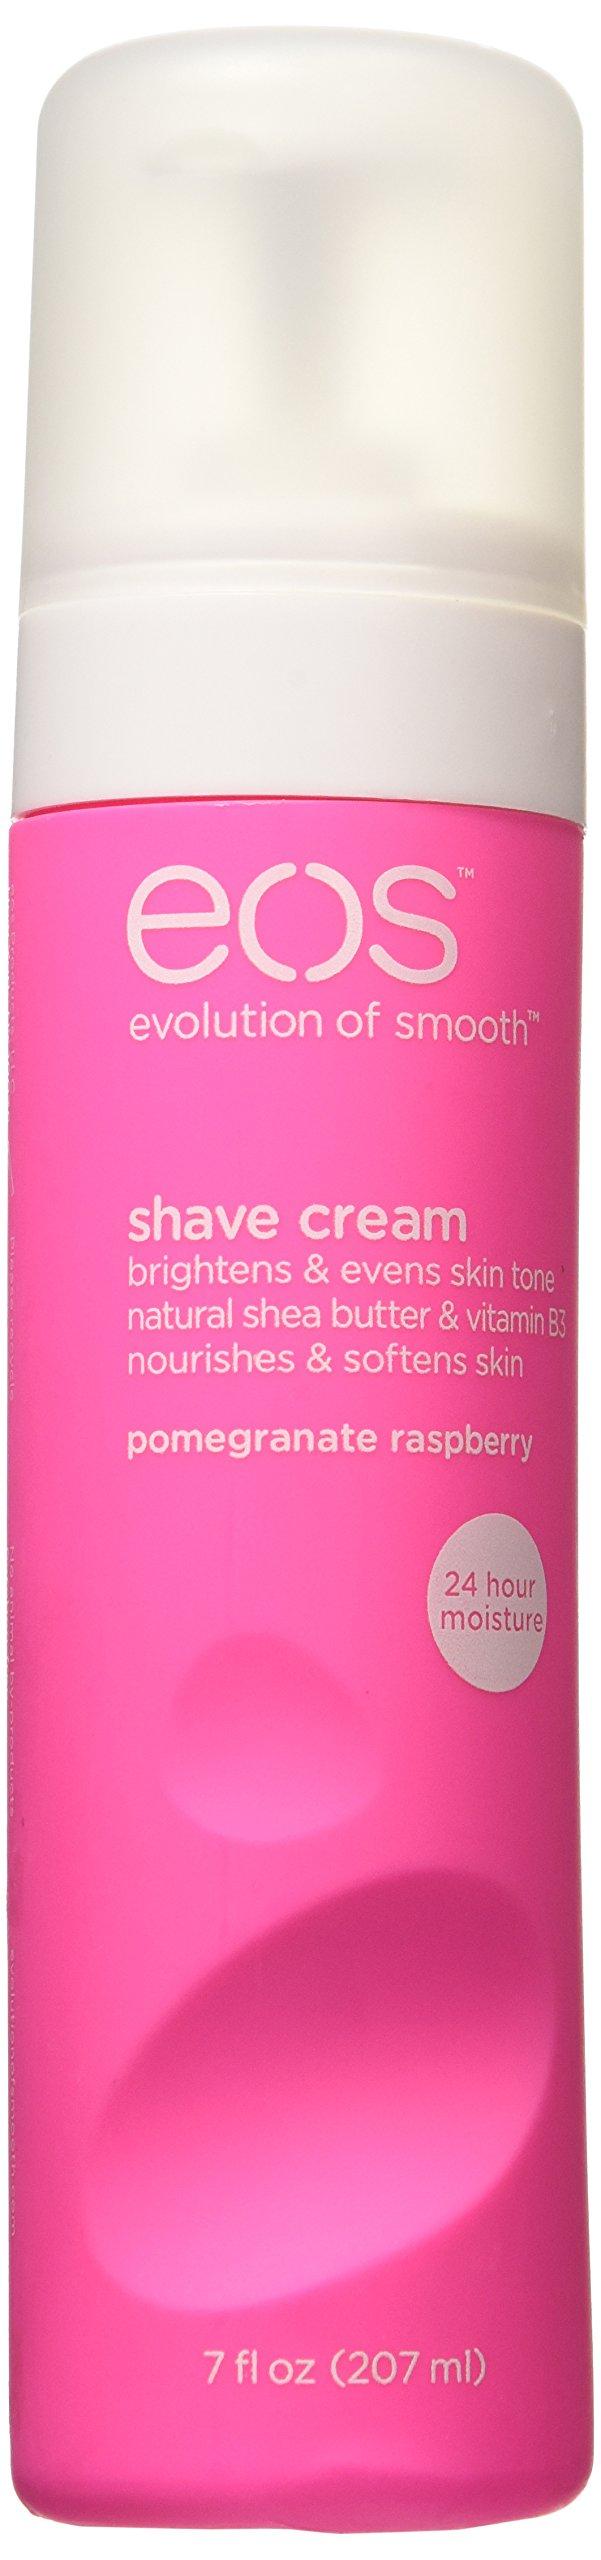 EOS Shave Cream, Pomegranate Raspberry, 7 oz (Pack of 6)